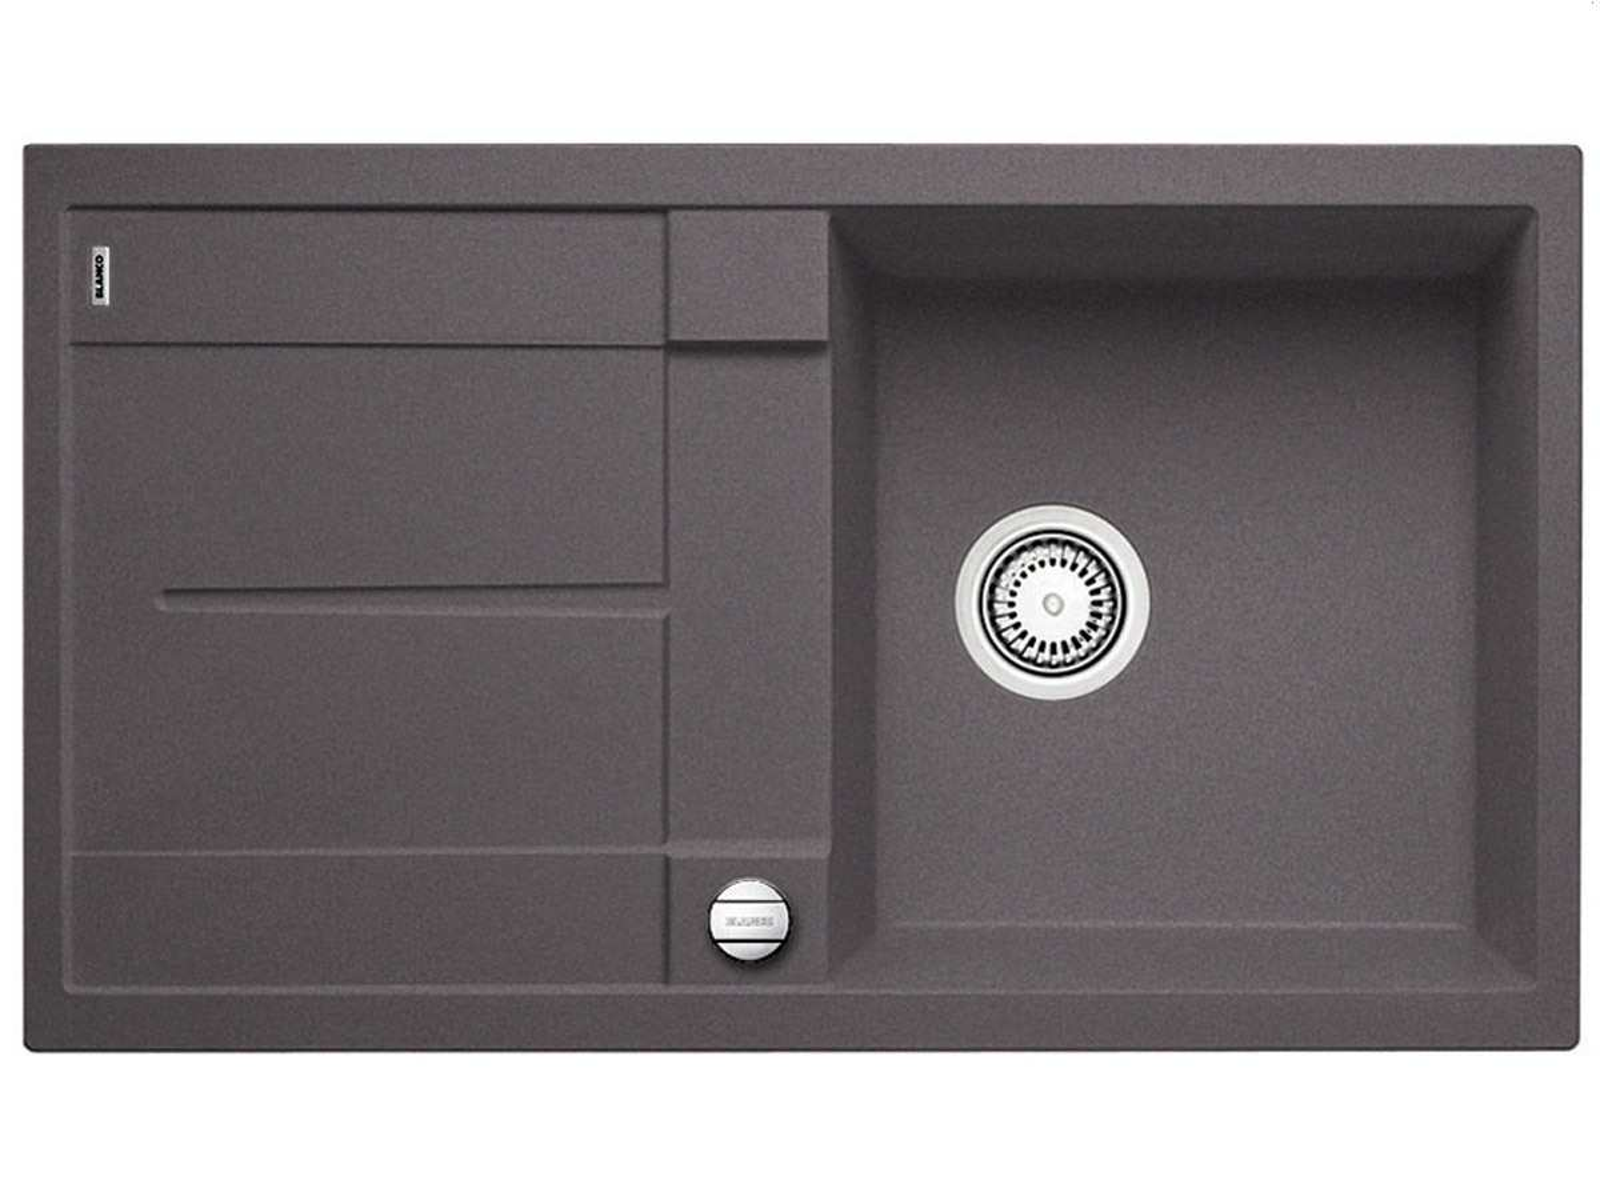 blanco metra 5 s felsgrau granit sp le f r 254 90 eur. Black Bedroom Furniture Sets. Home Design Ideas